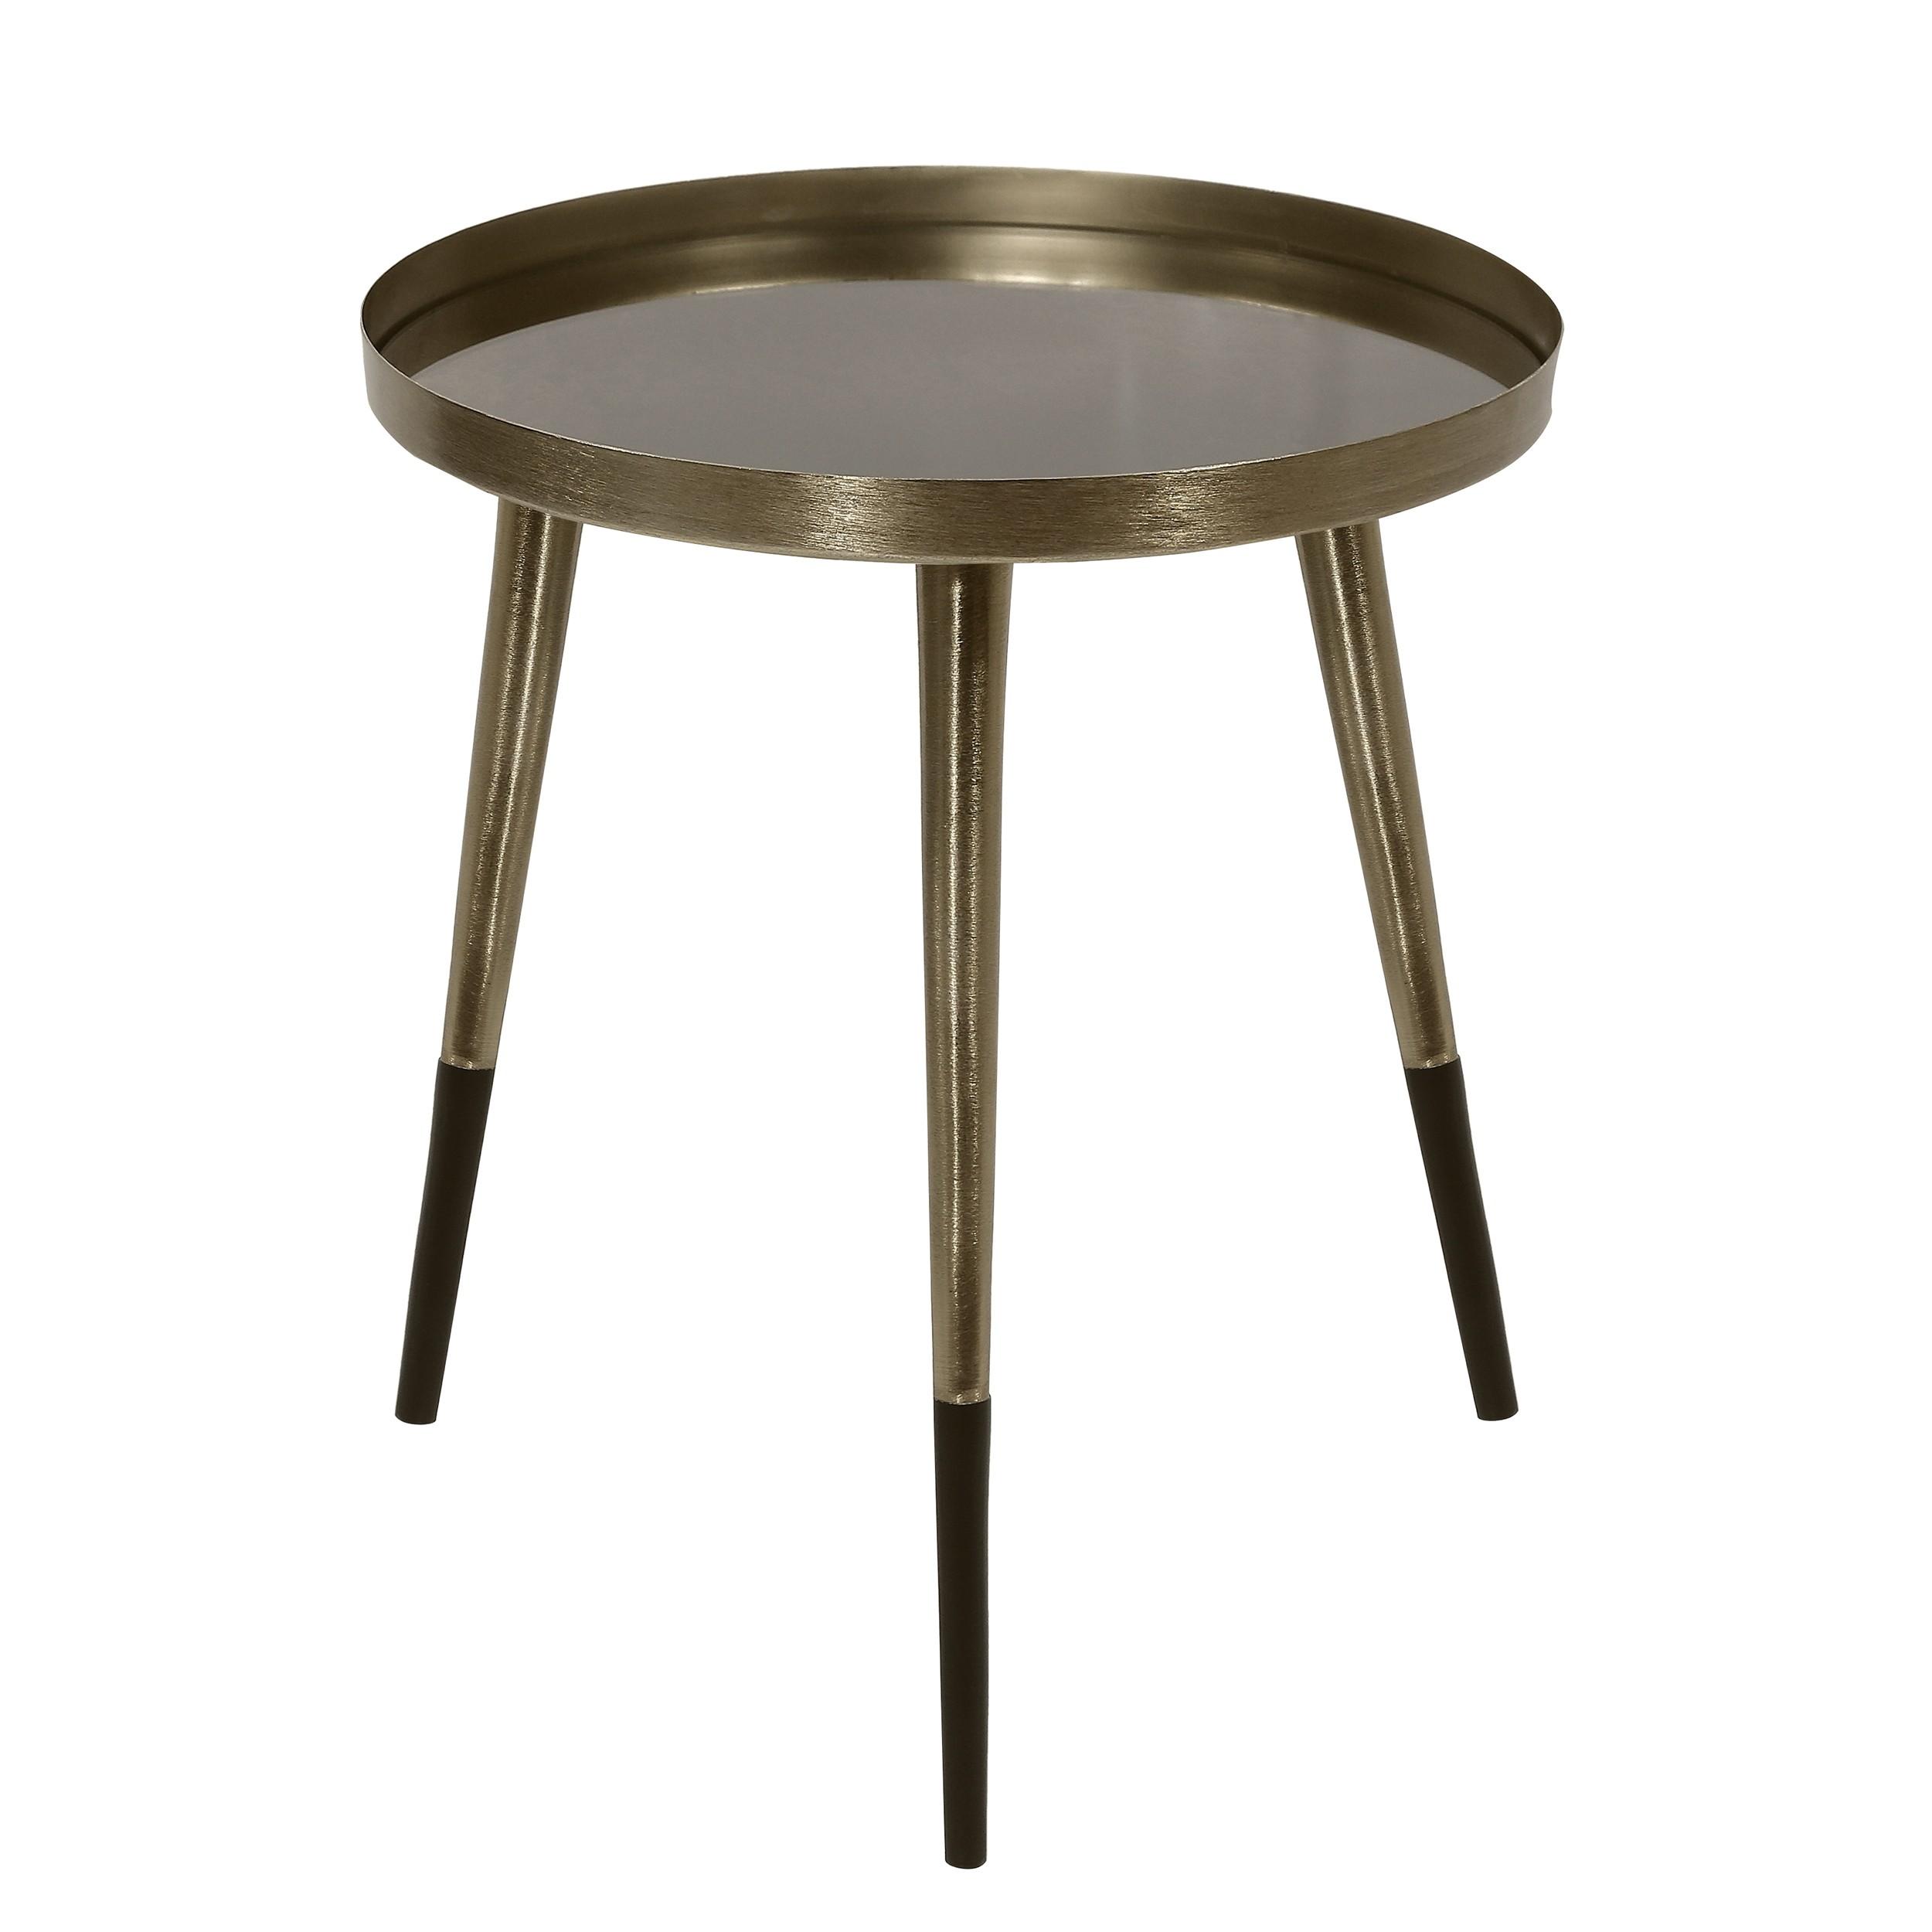 table basse ronde almalu laiton commandez les tables basses rondes almalu laiton rdv d co. Black Bedroom Furniture Sets. Home Design Ideas